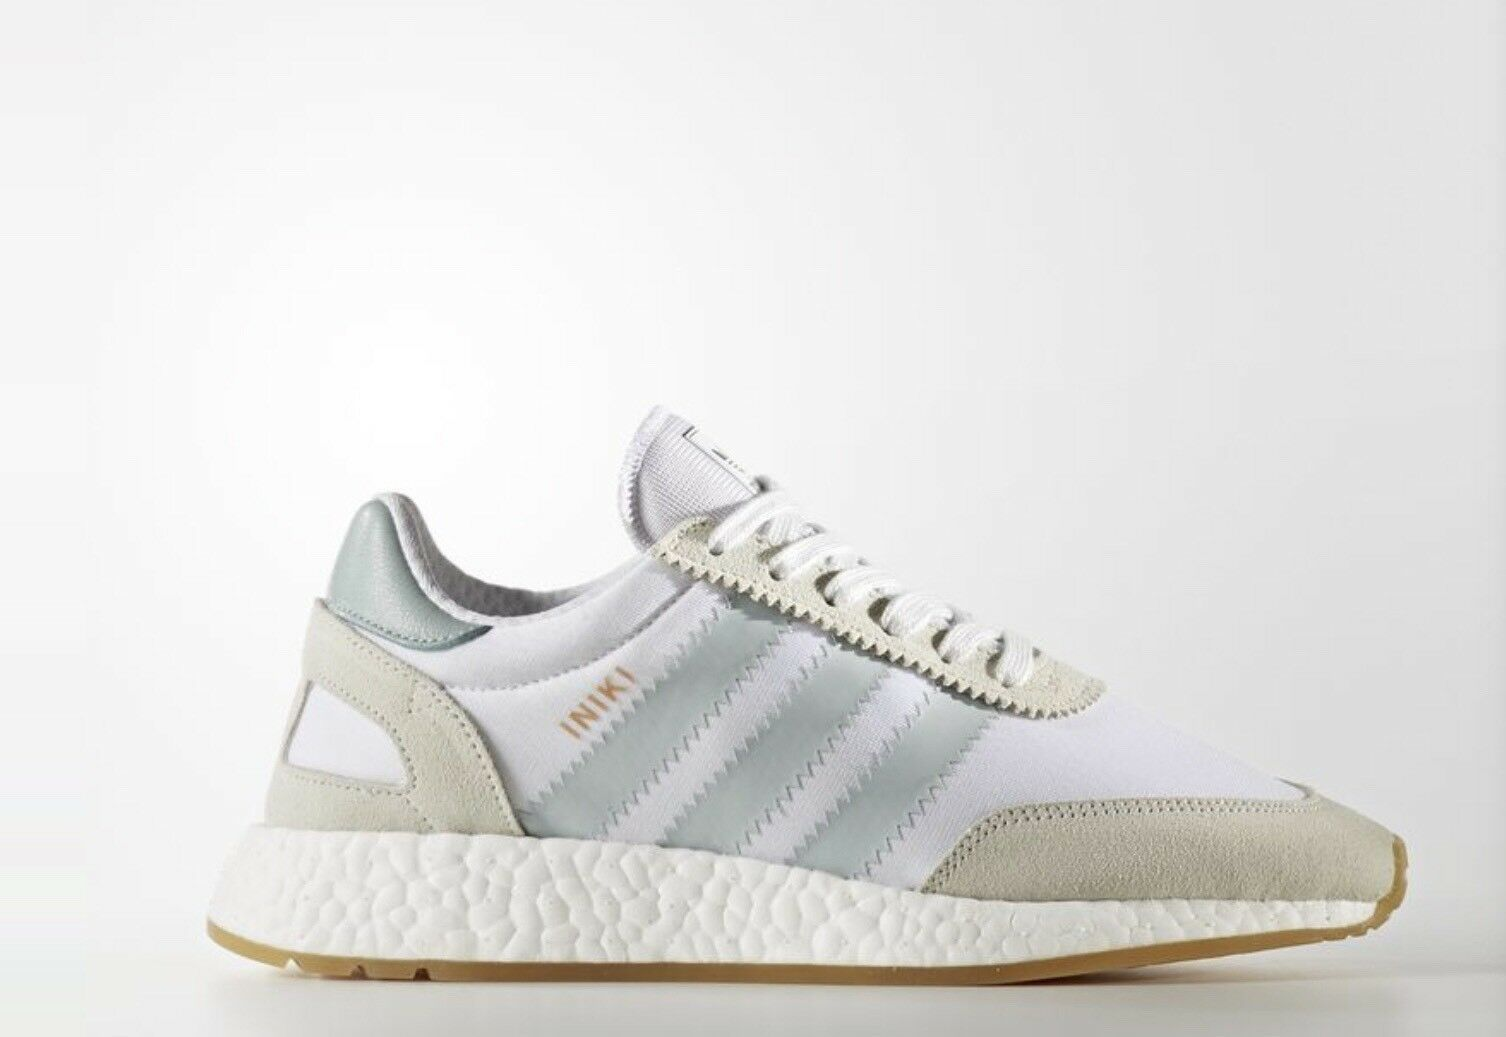 Nuove verde adidas originali by9092 donne iniki runner bianco / verde Nuove / caramello scarpe us9 7aa50e